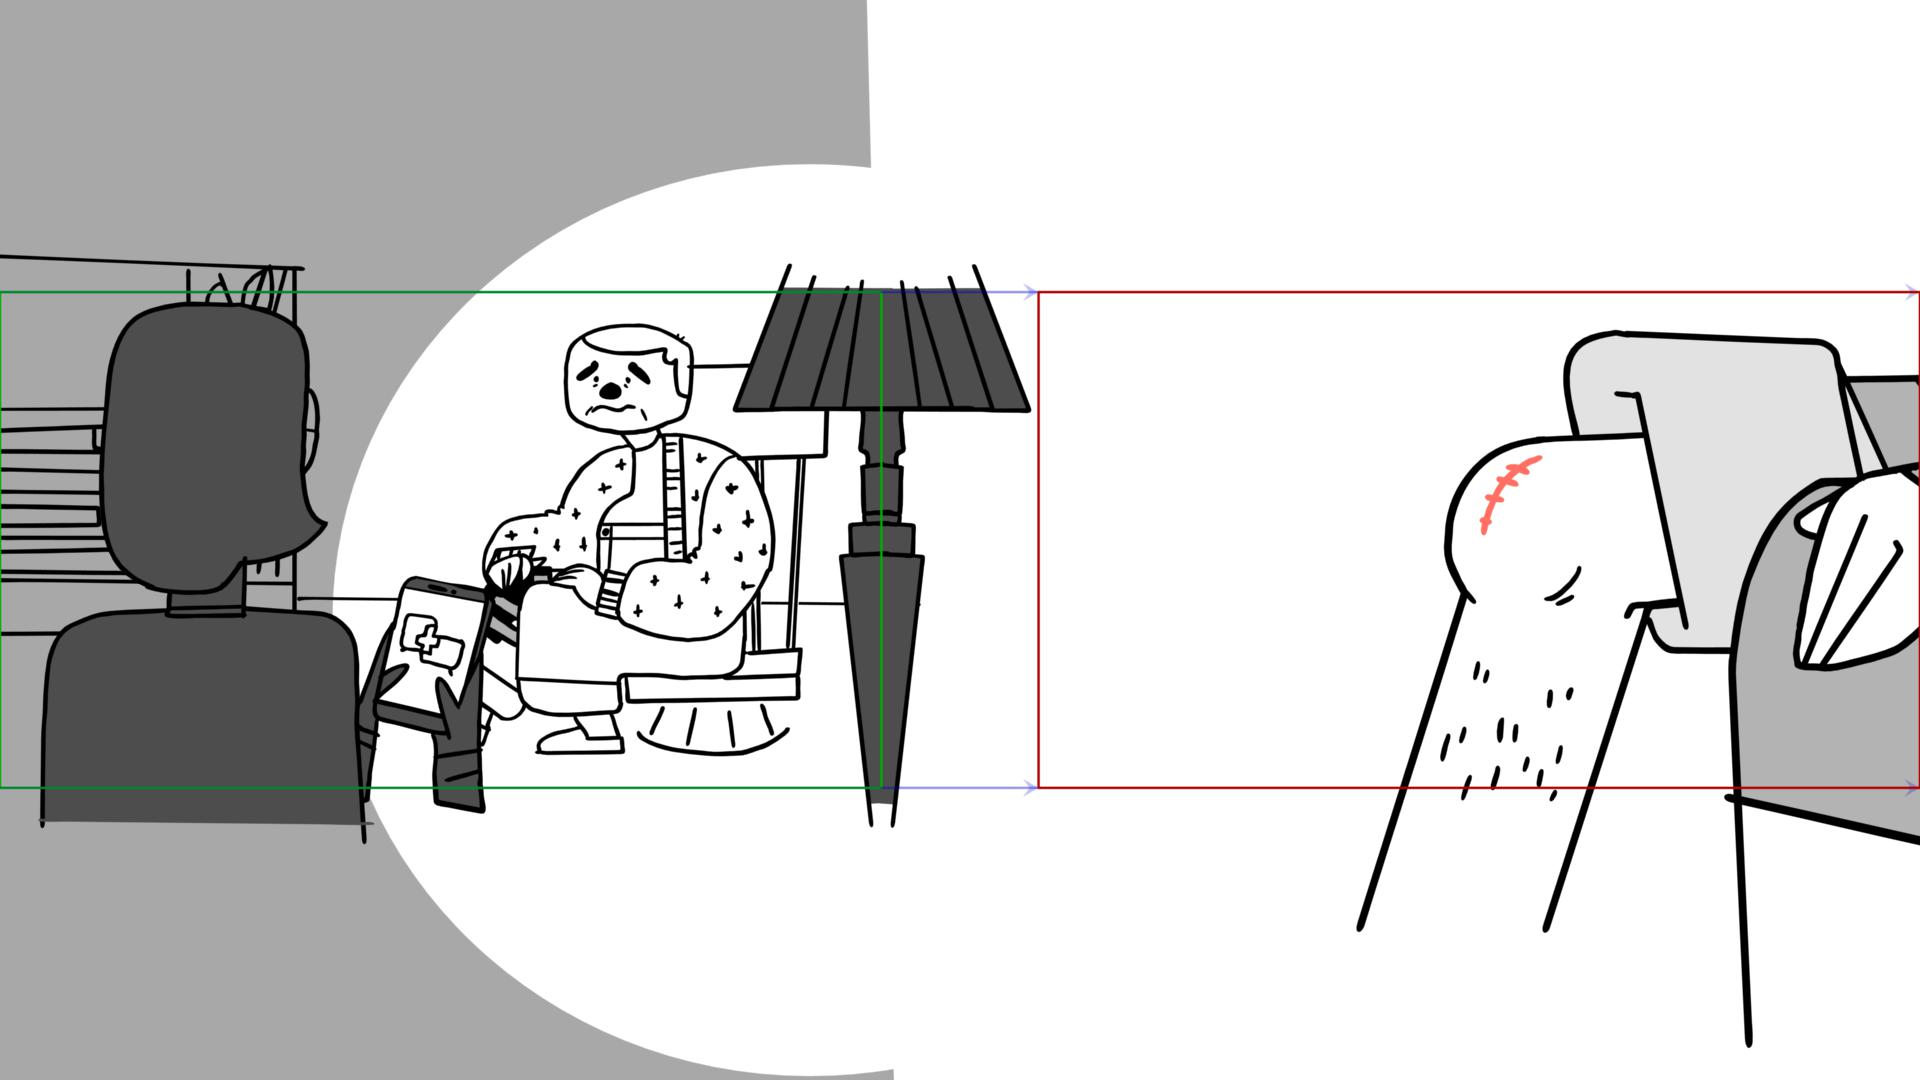 Medici_Storyboards_01-00001_A_1-11.jpg